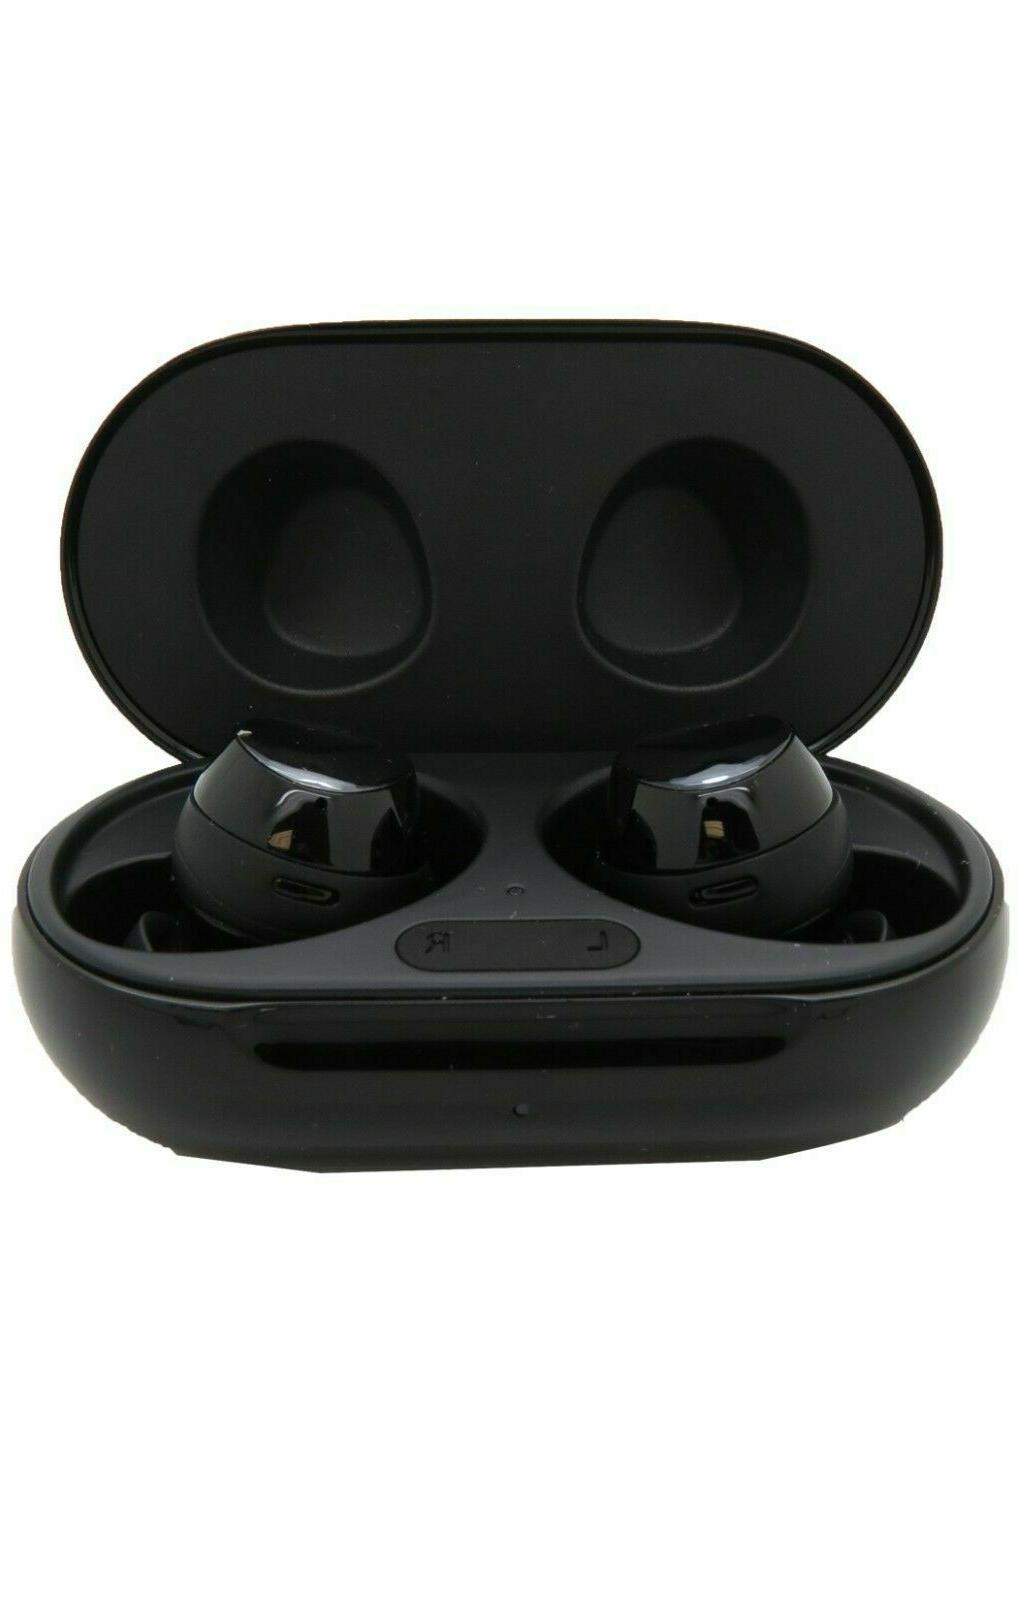 Samsung Buds+ SM-R175 2020 Wireless Earbuds